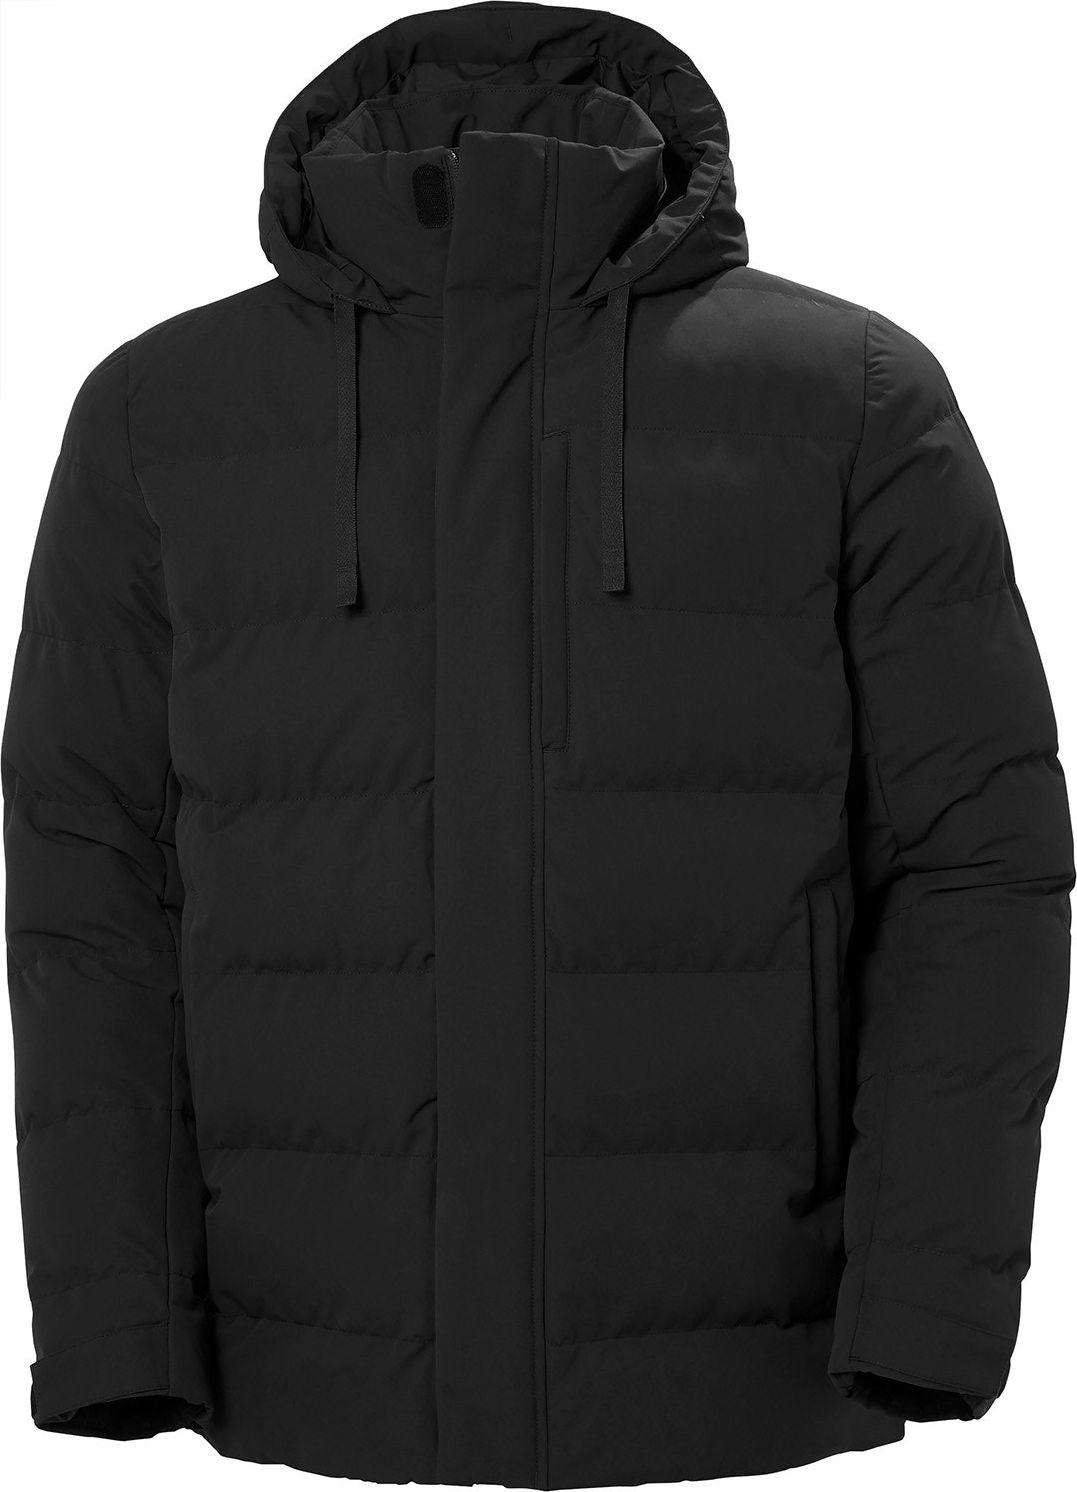 HELLY HANSEN Mono Material Puffy Jacket Black M